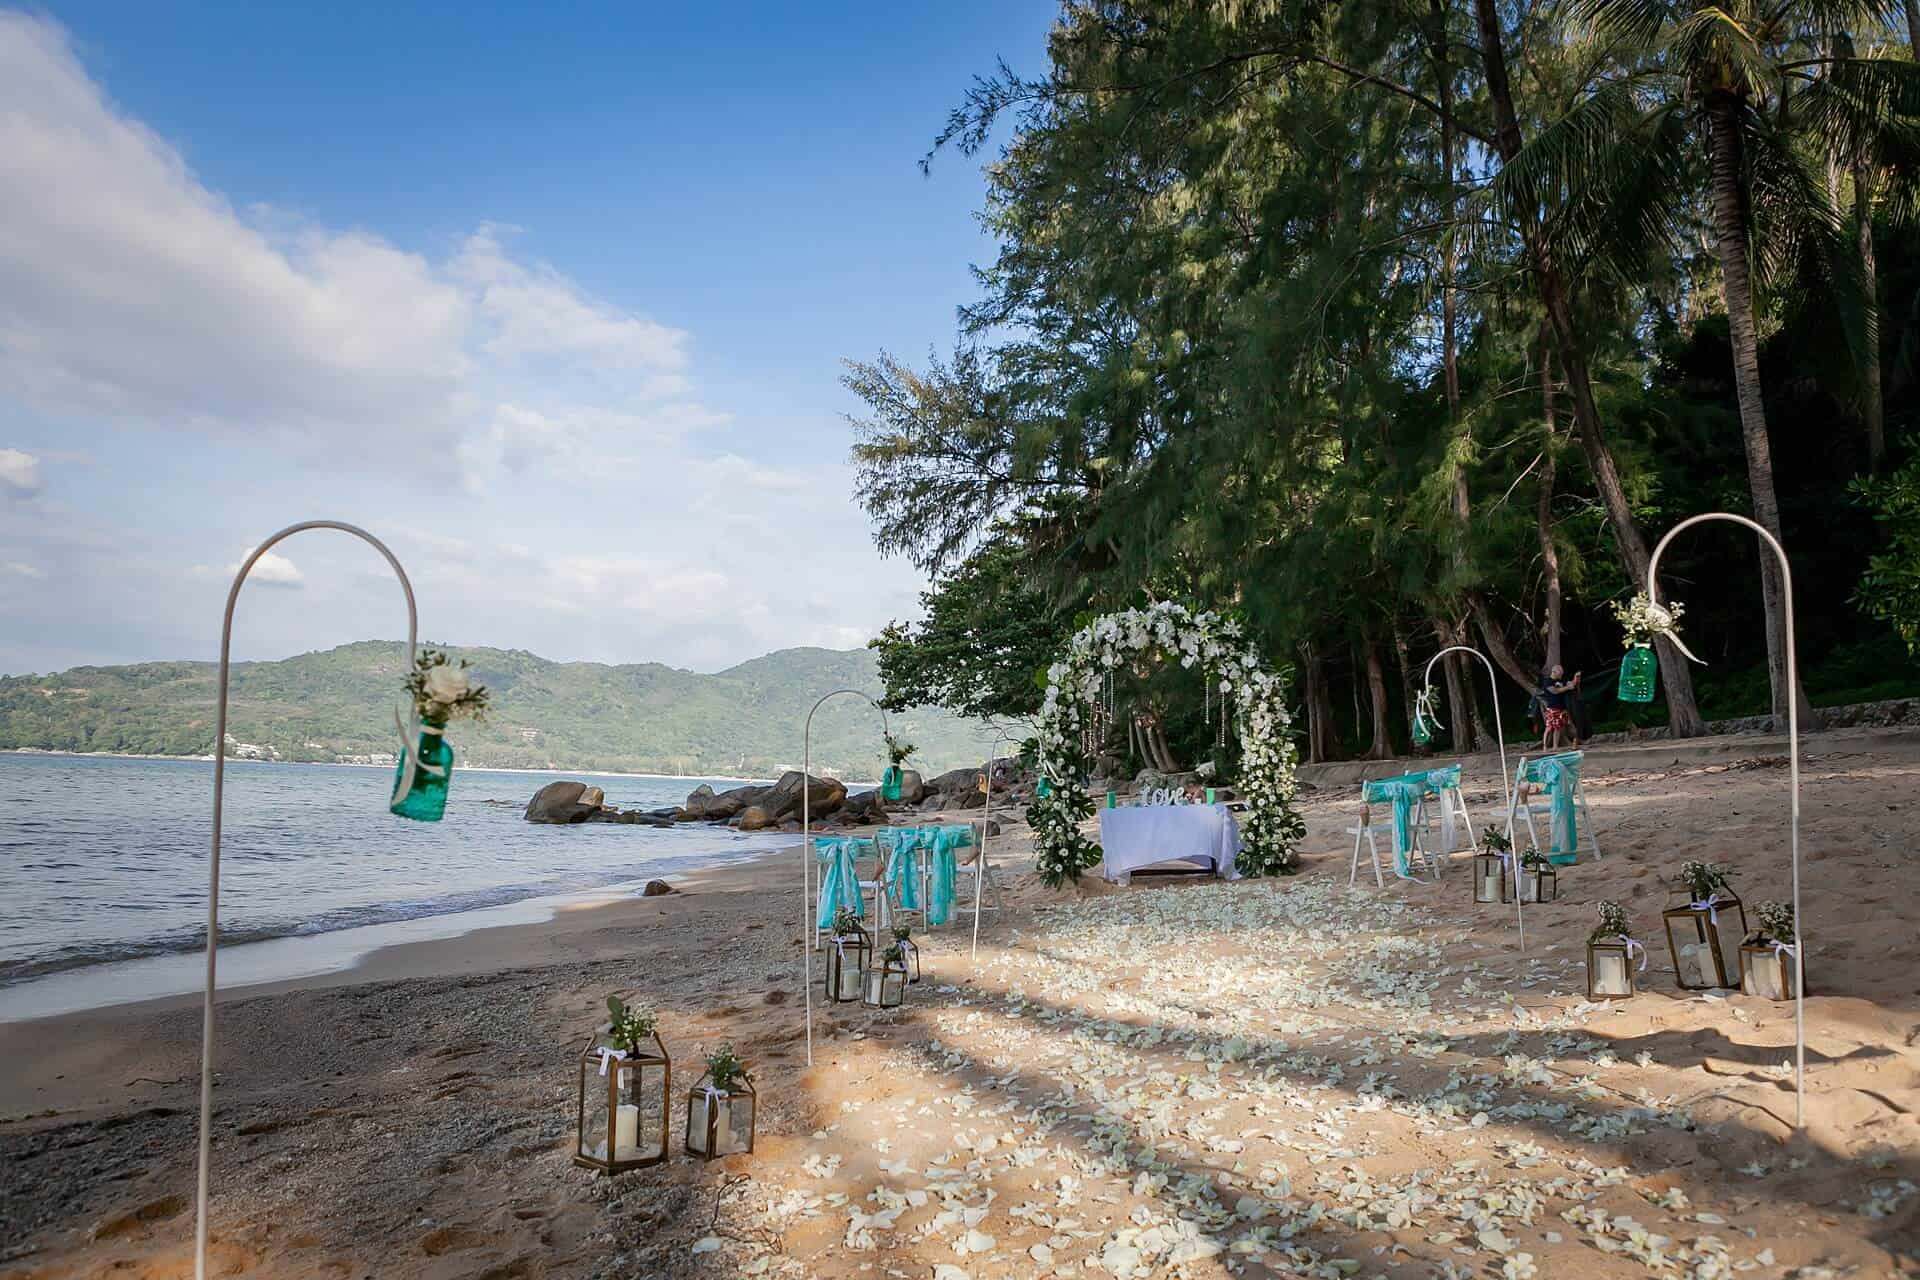 Tina-Tim-Beach-Wedding-Vow-Renewal-2nd-Jan-2020-on-Hua-Beach-15